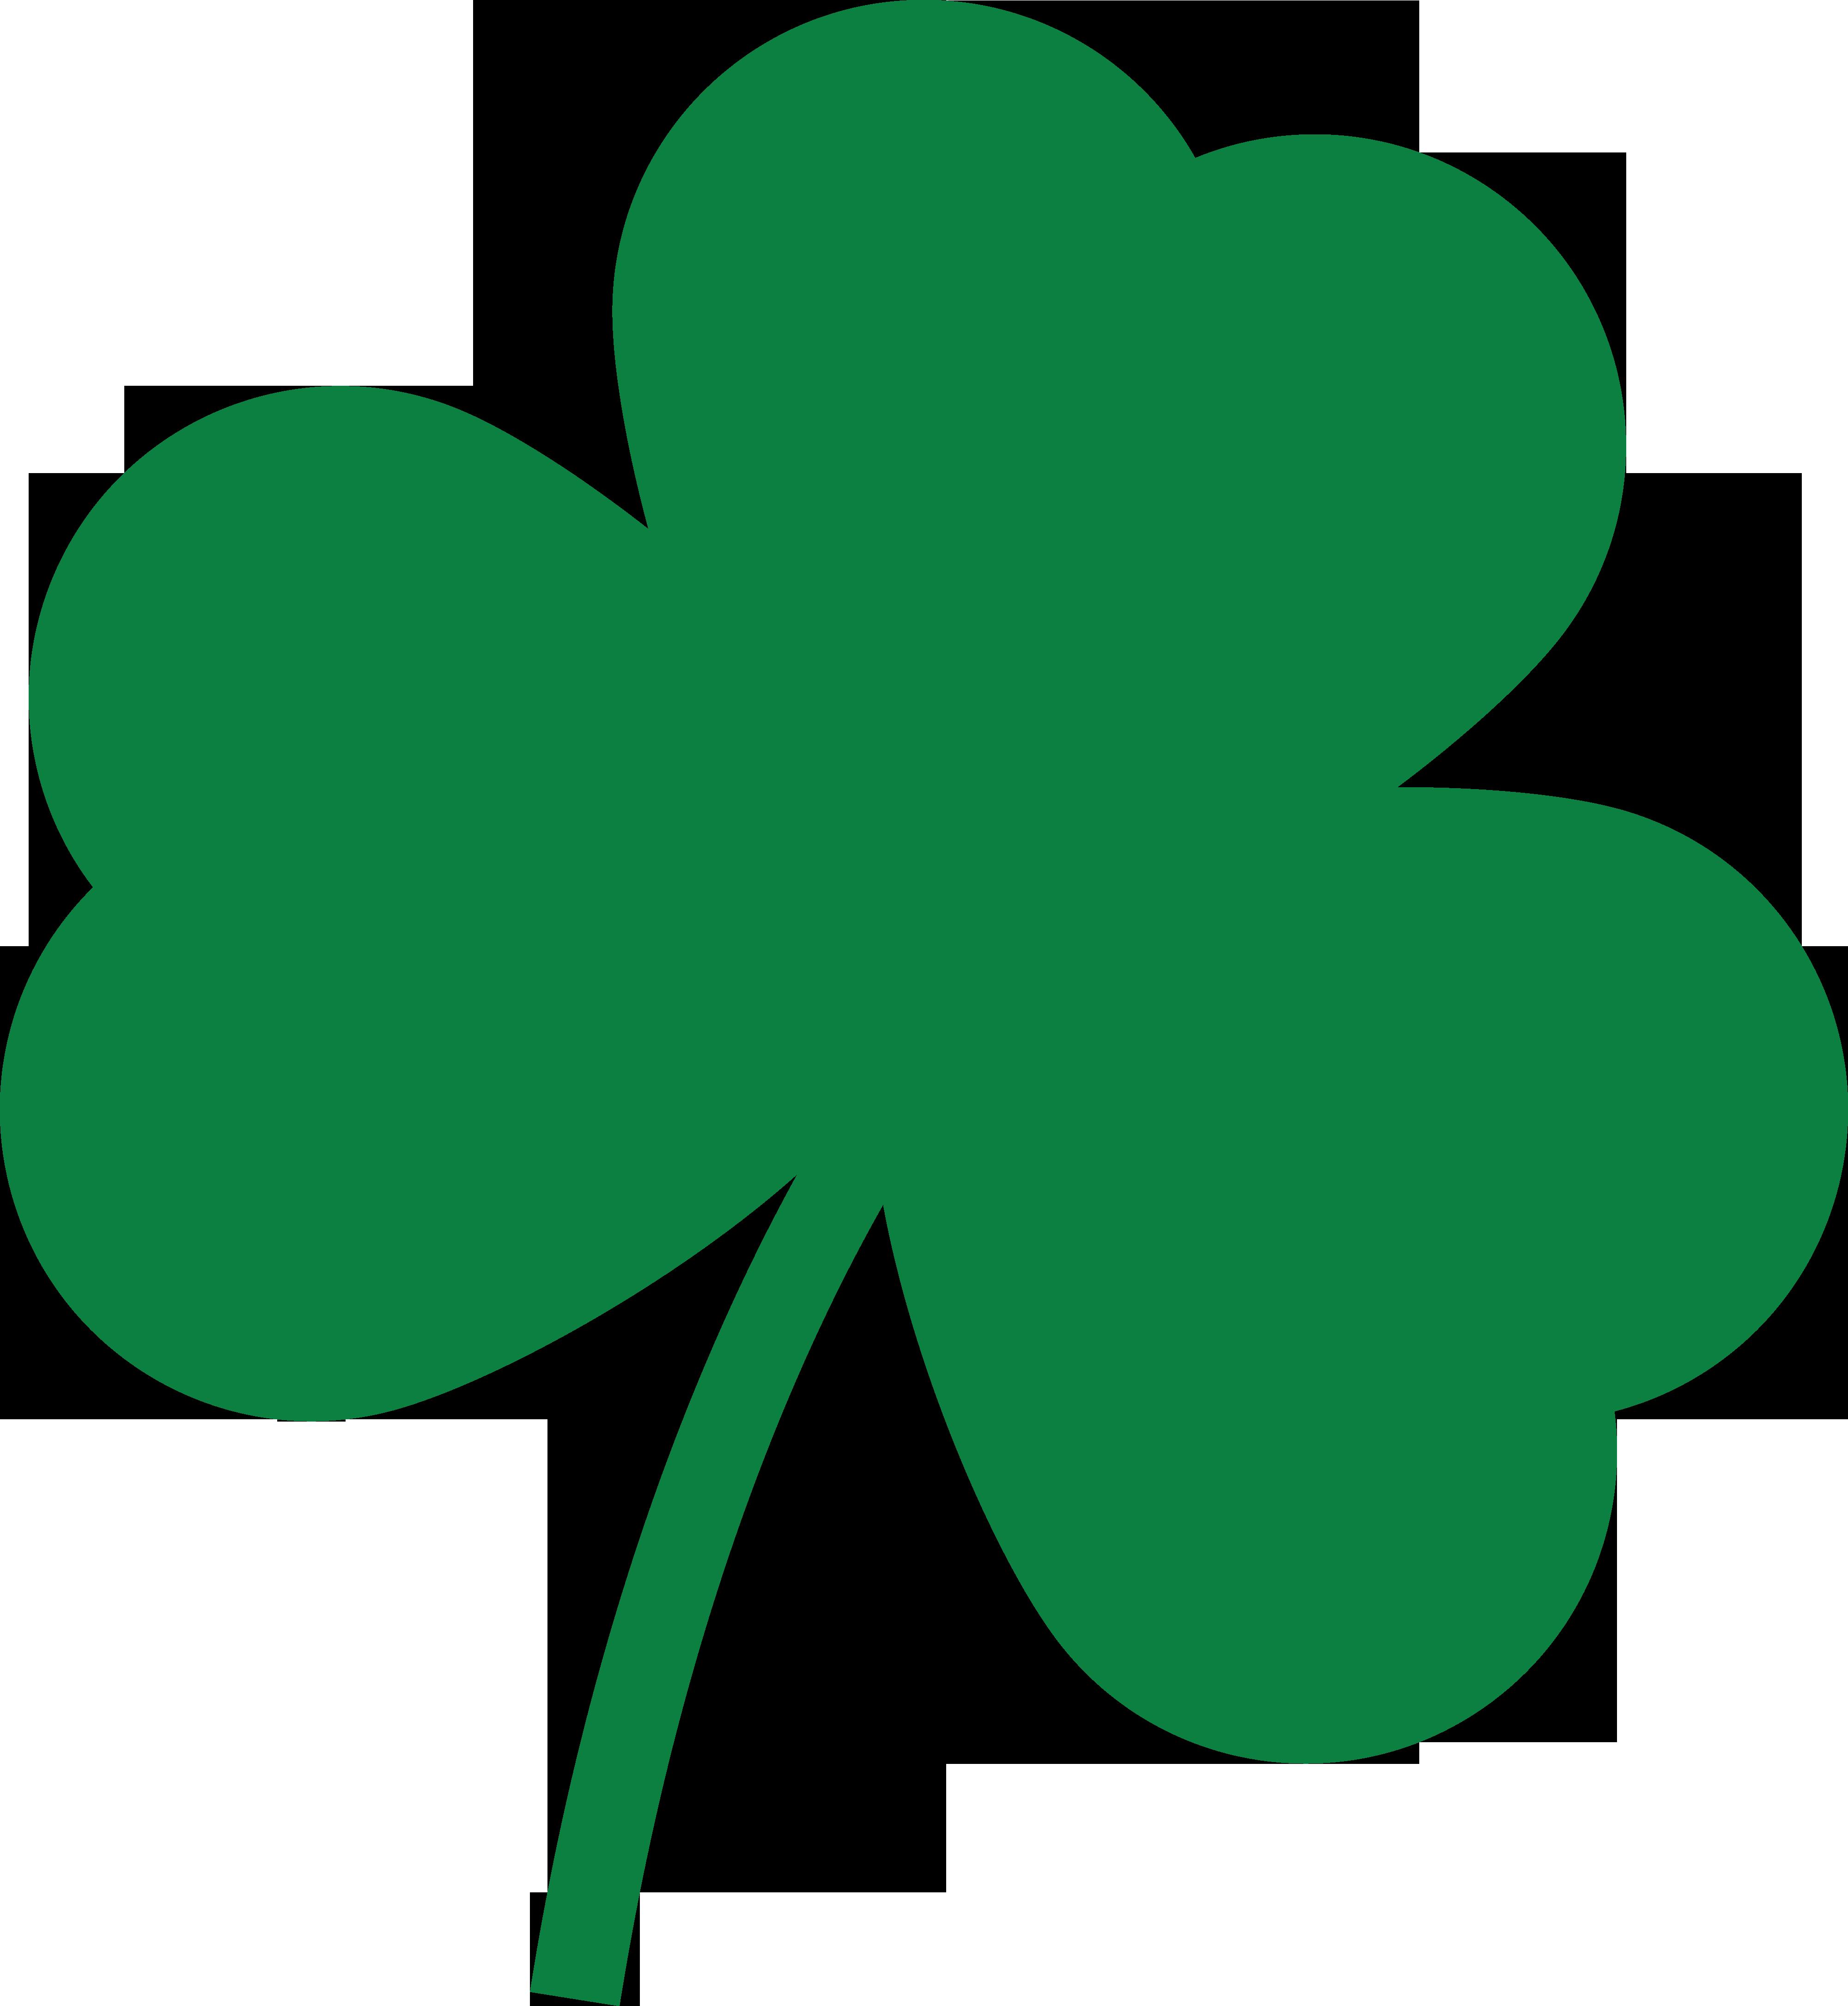 4 Leaf Clover Png   Free download on ClipArtMag